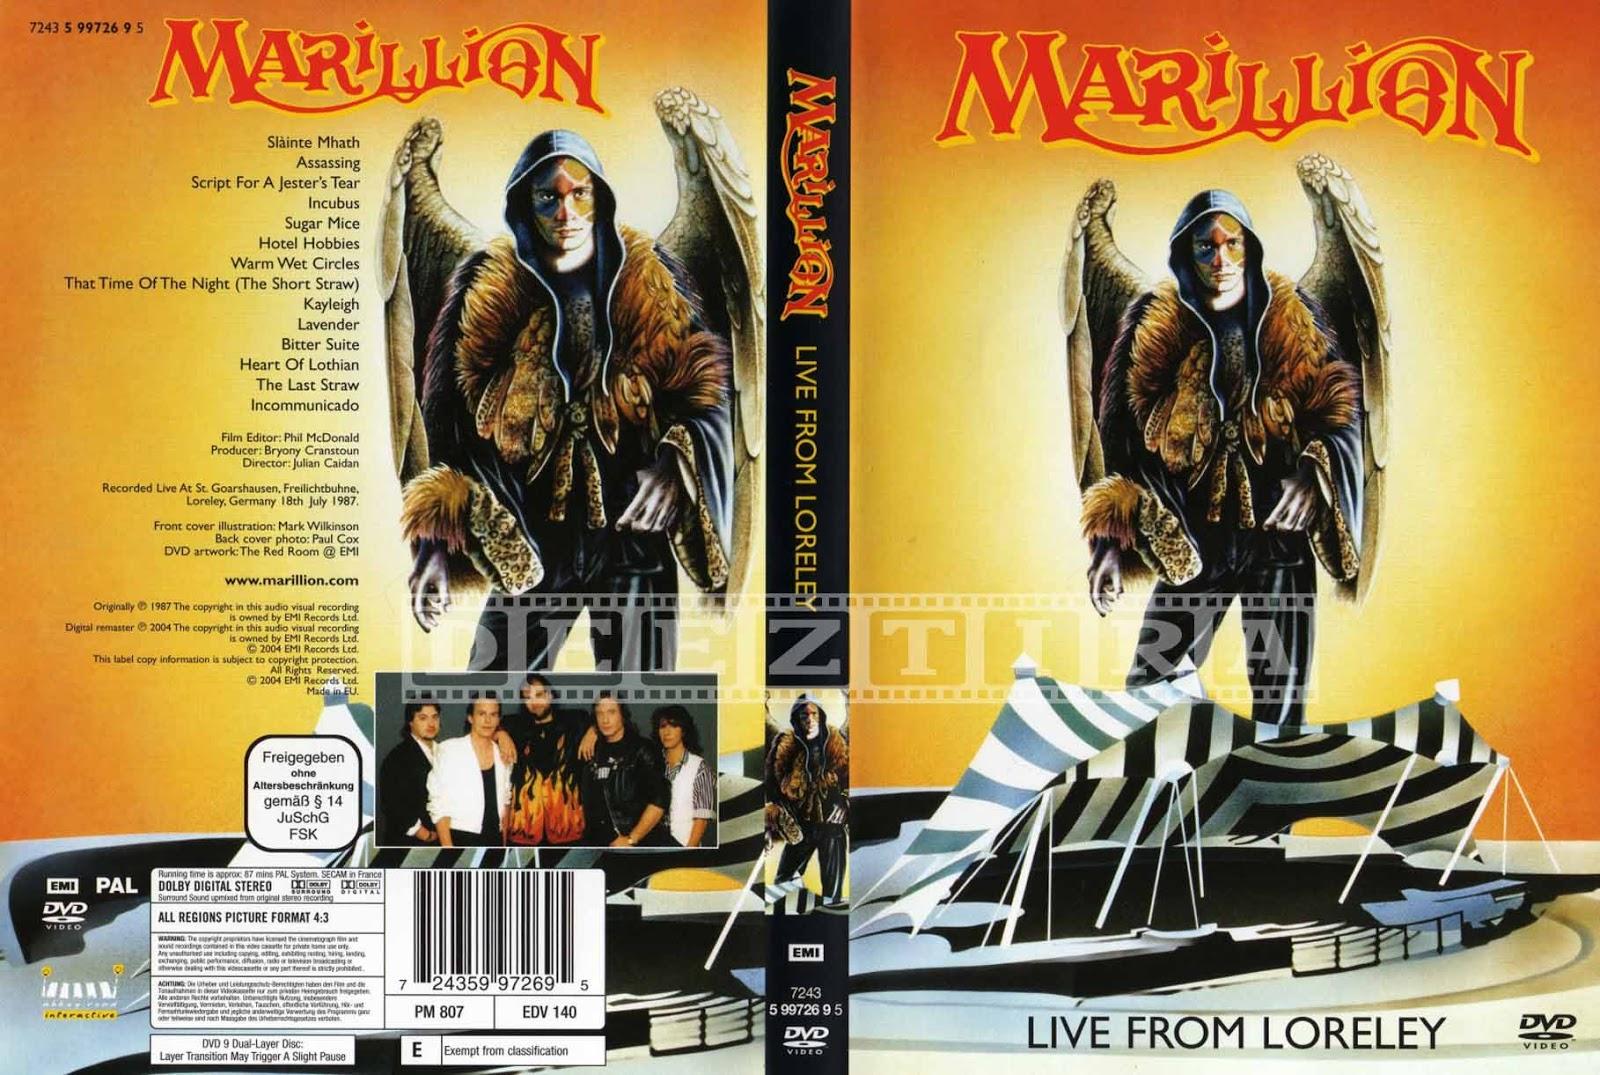 Marillion - Live